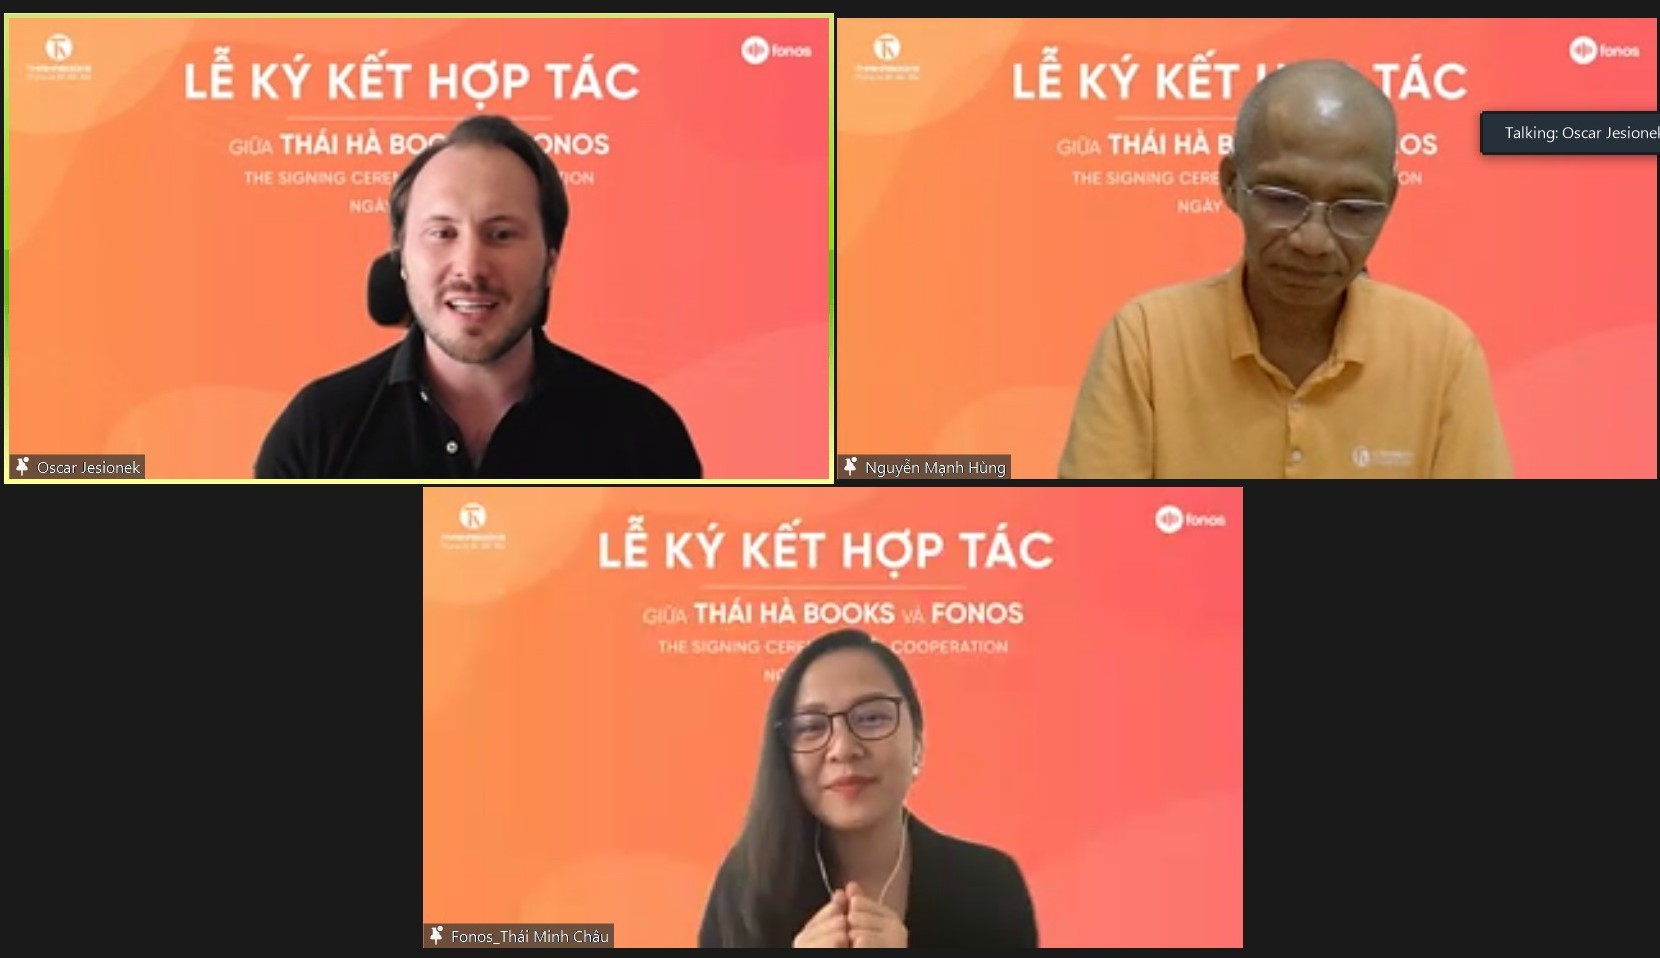 Le Ky Ket Hop Tac Thaihabooks Va Fonos